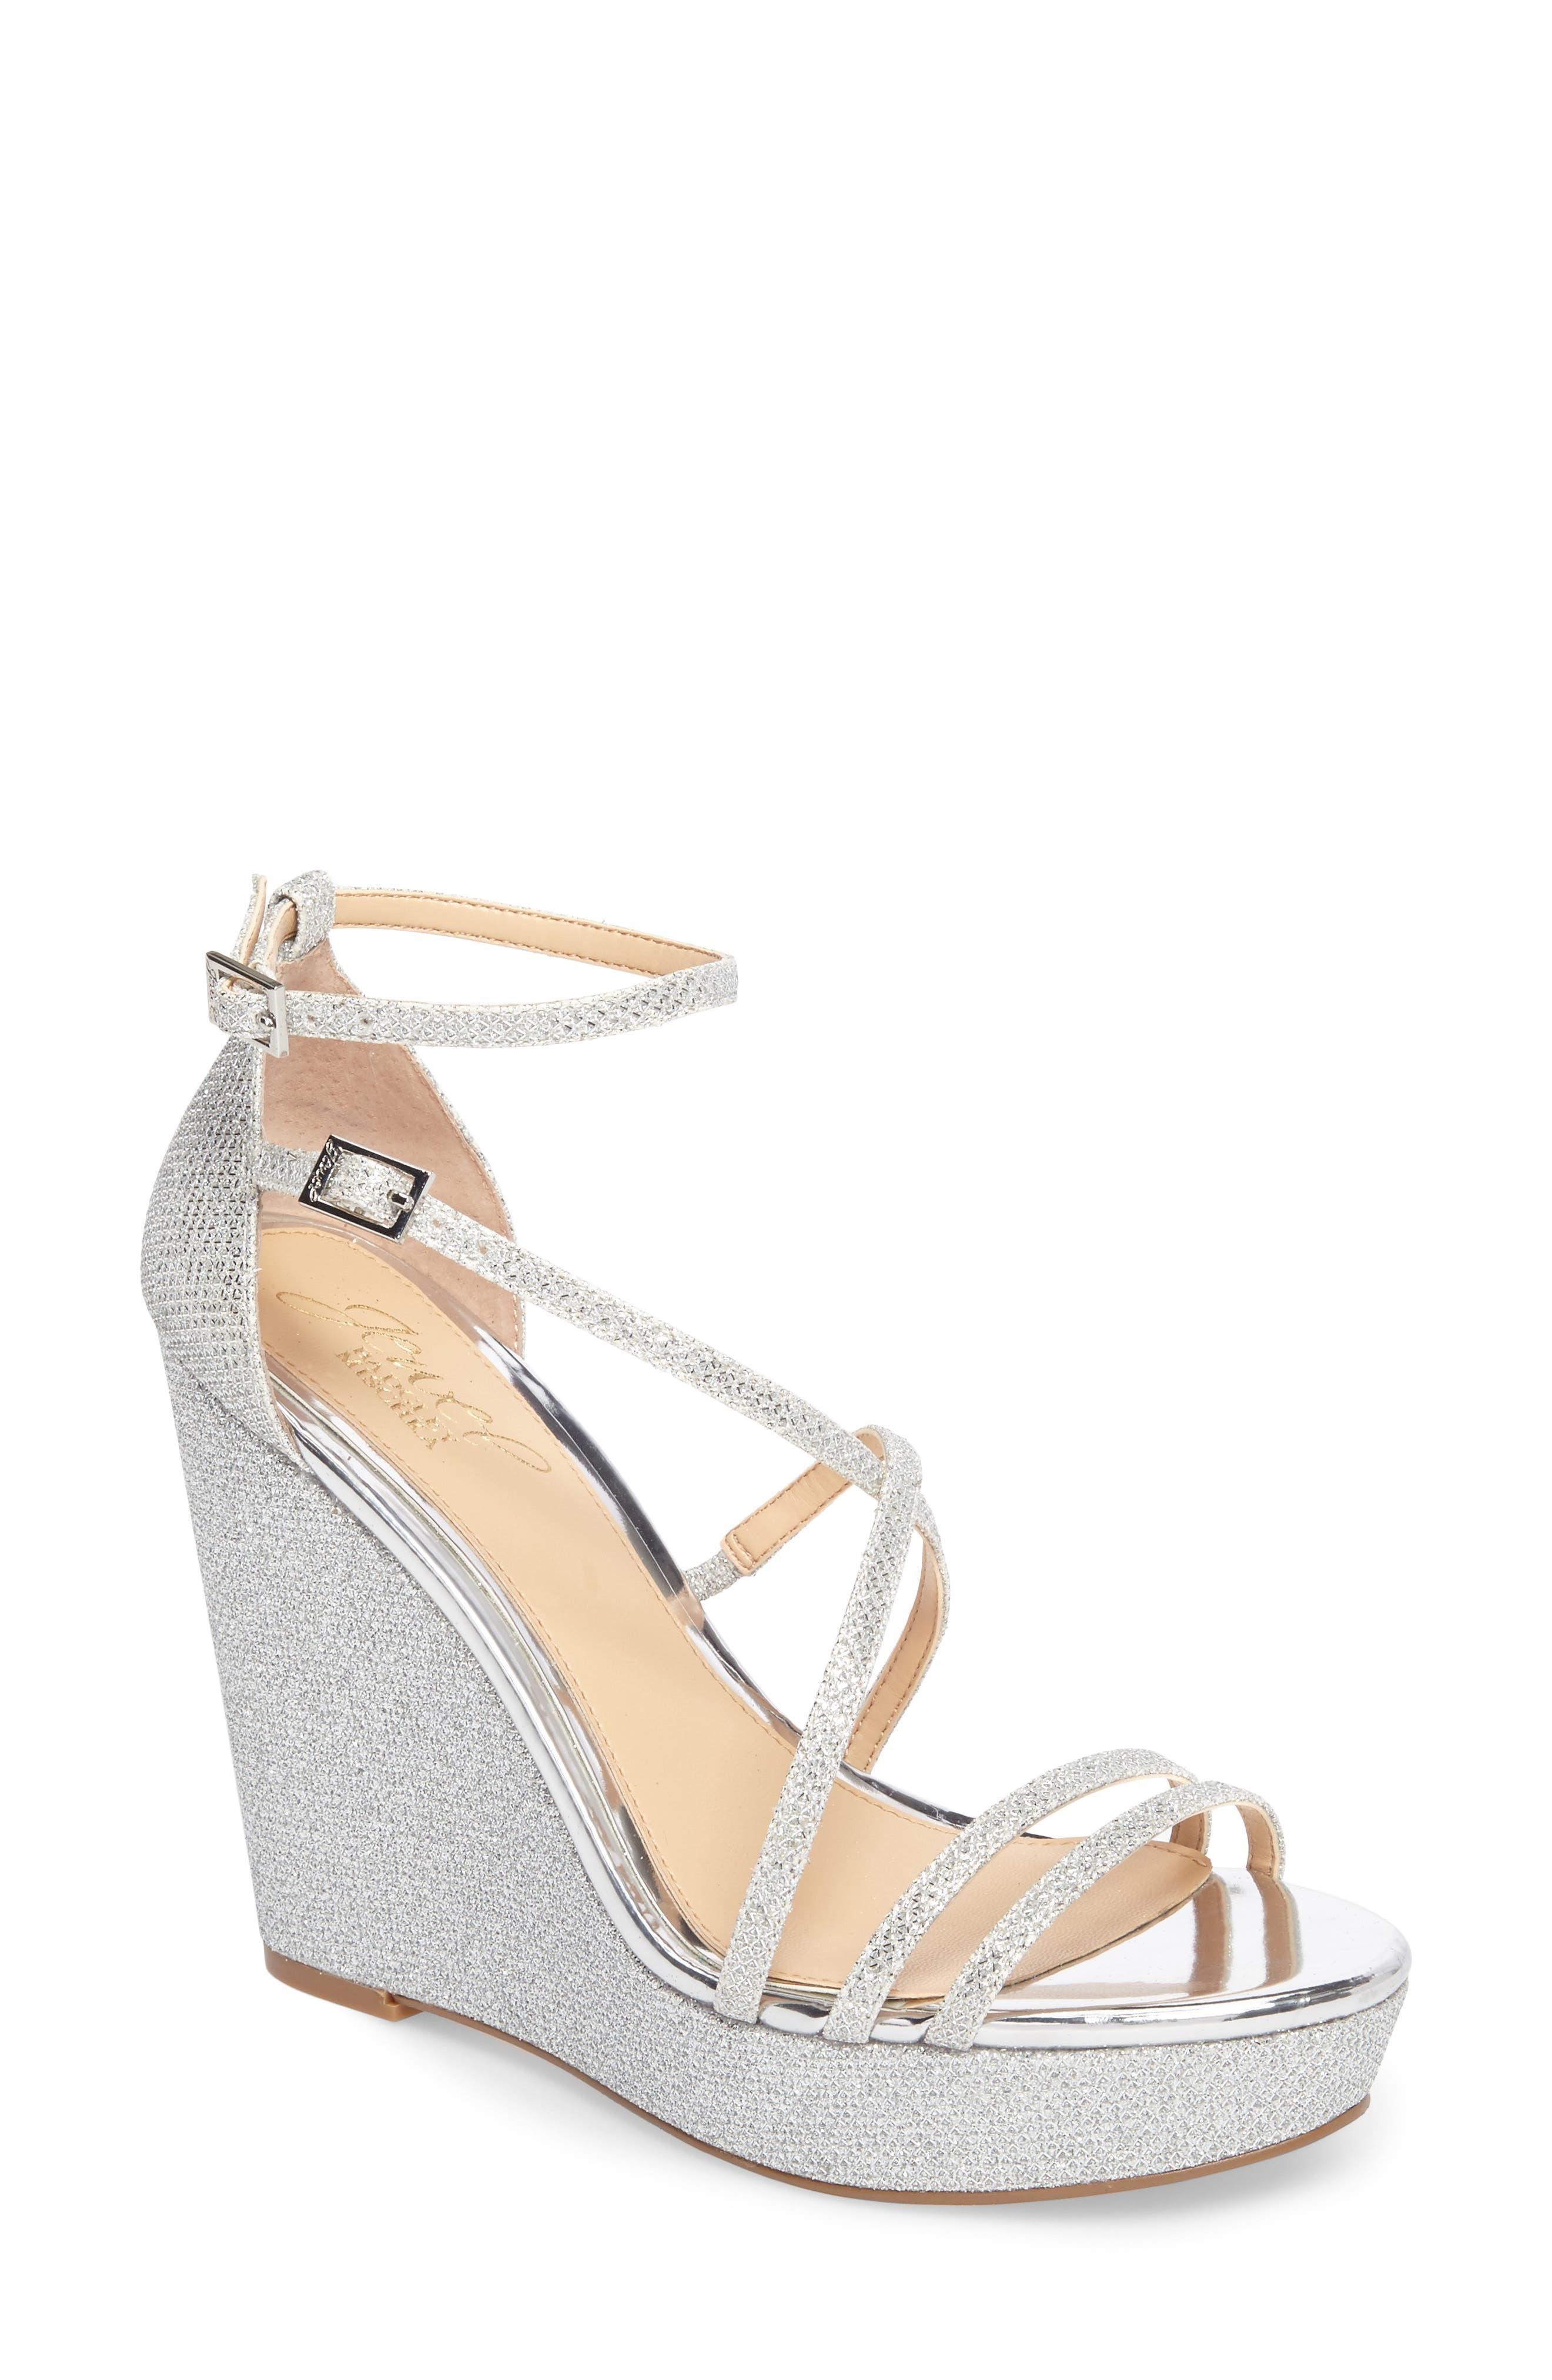 Tatsu Wedge Sandal,                         Main,                         color, Silver Glitter